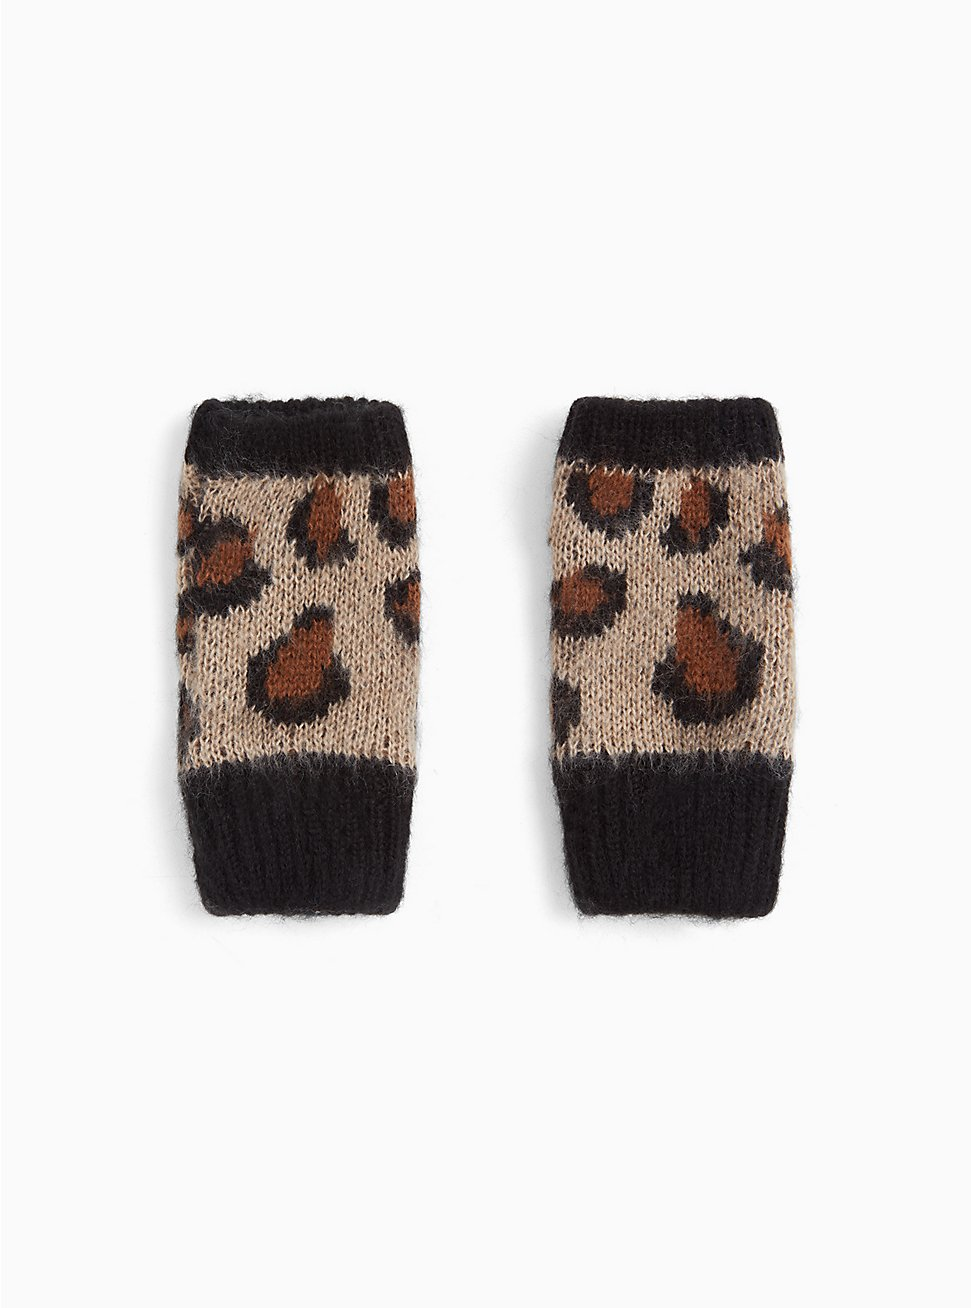 Leopard Print Fingerless Gloves, , hi-res